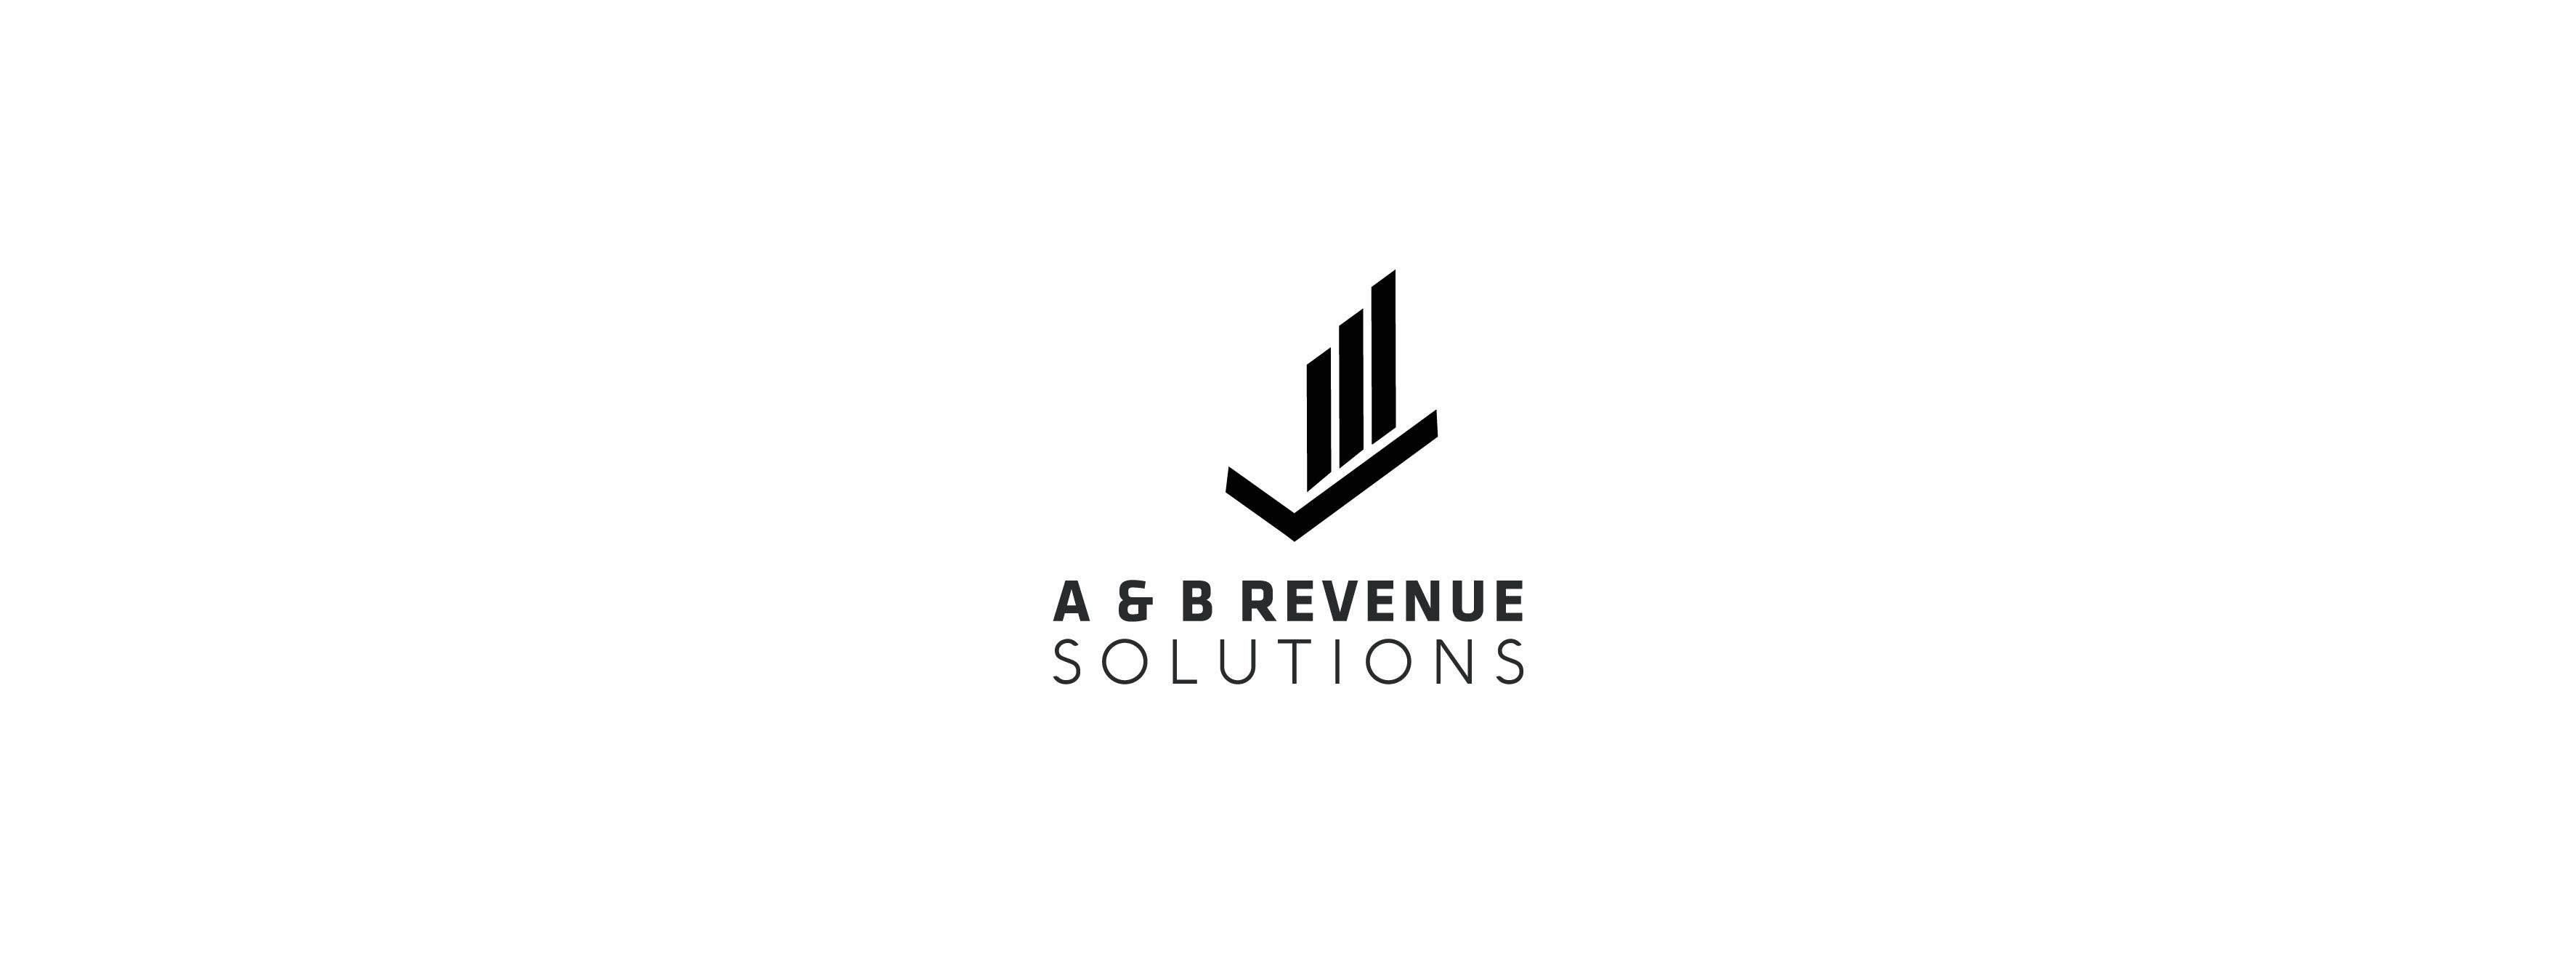 A&B Revenue Solutions